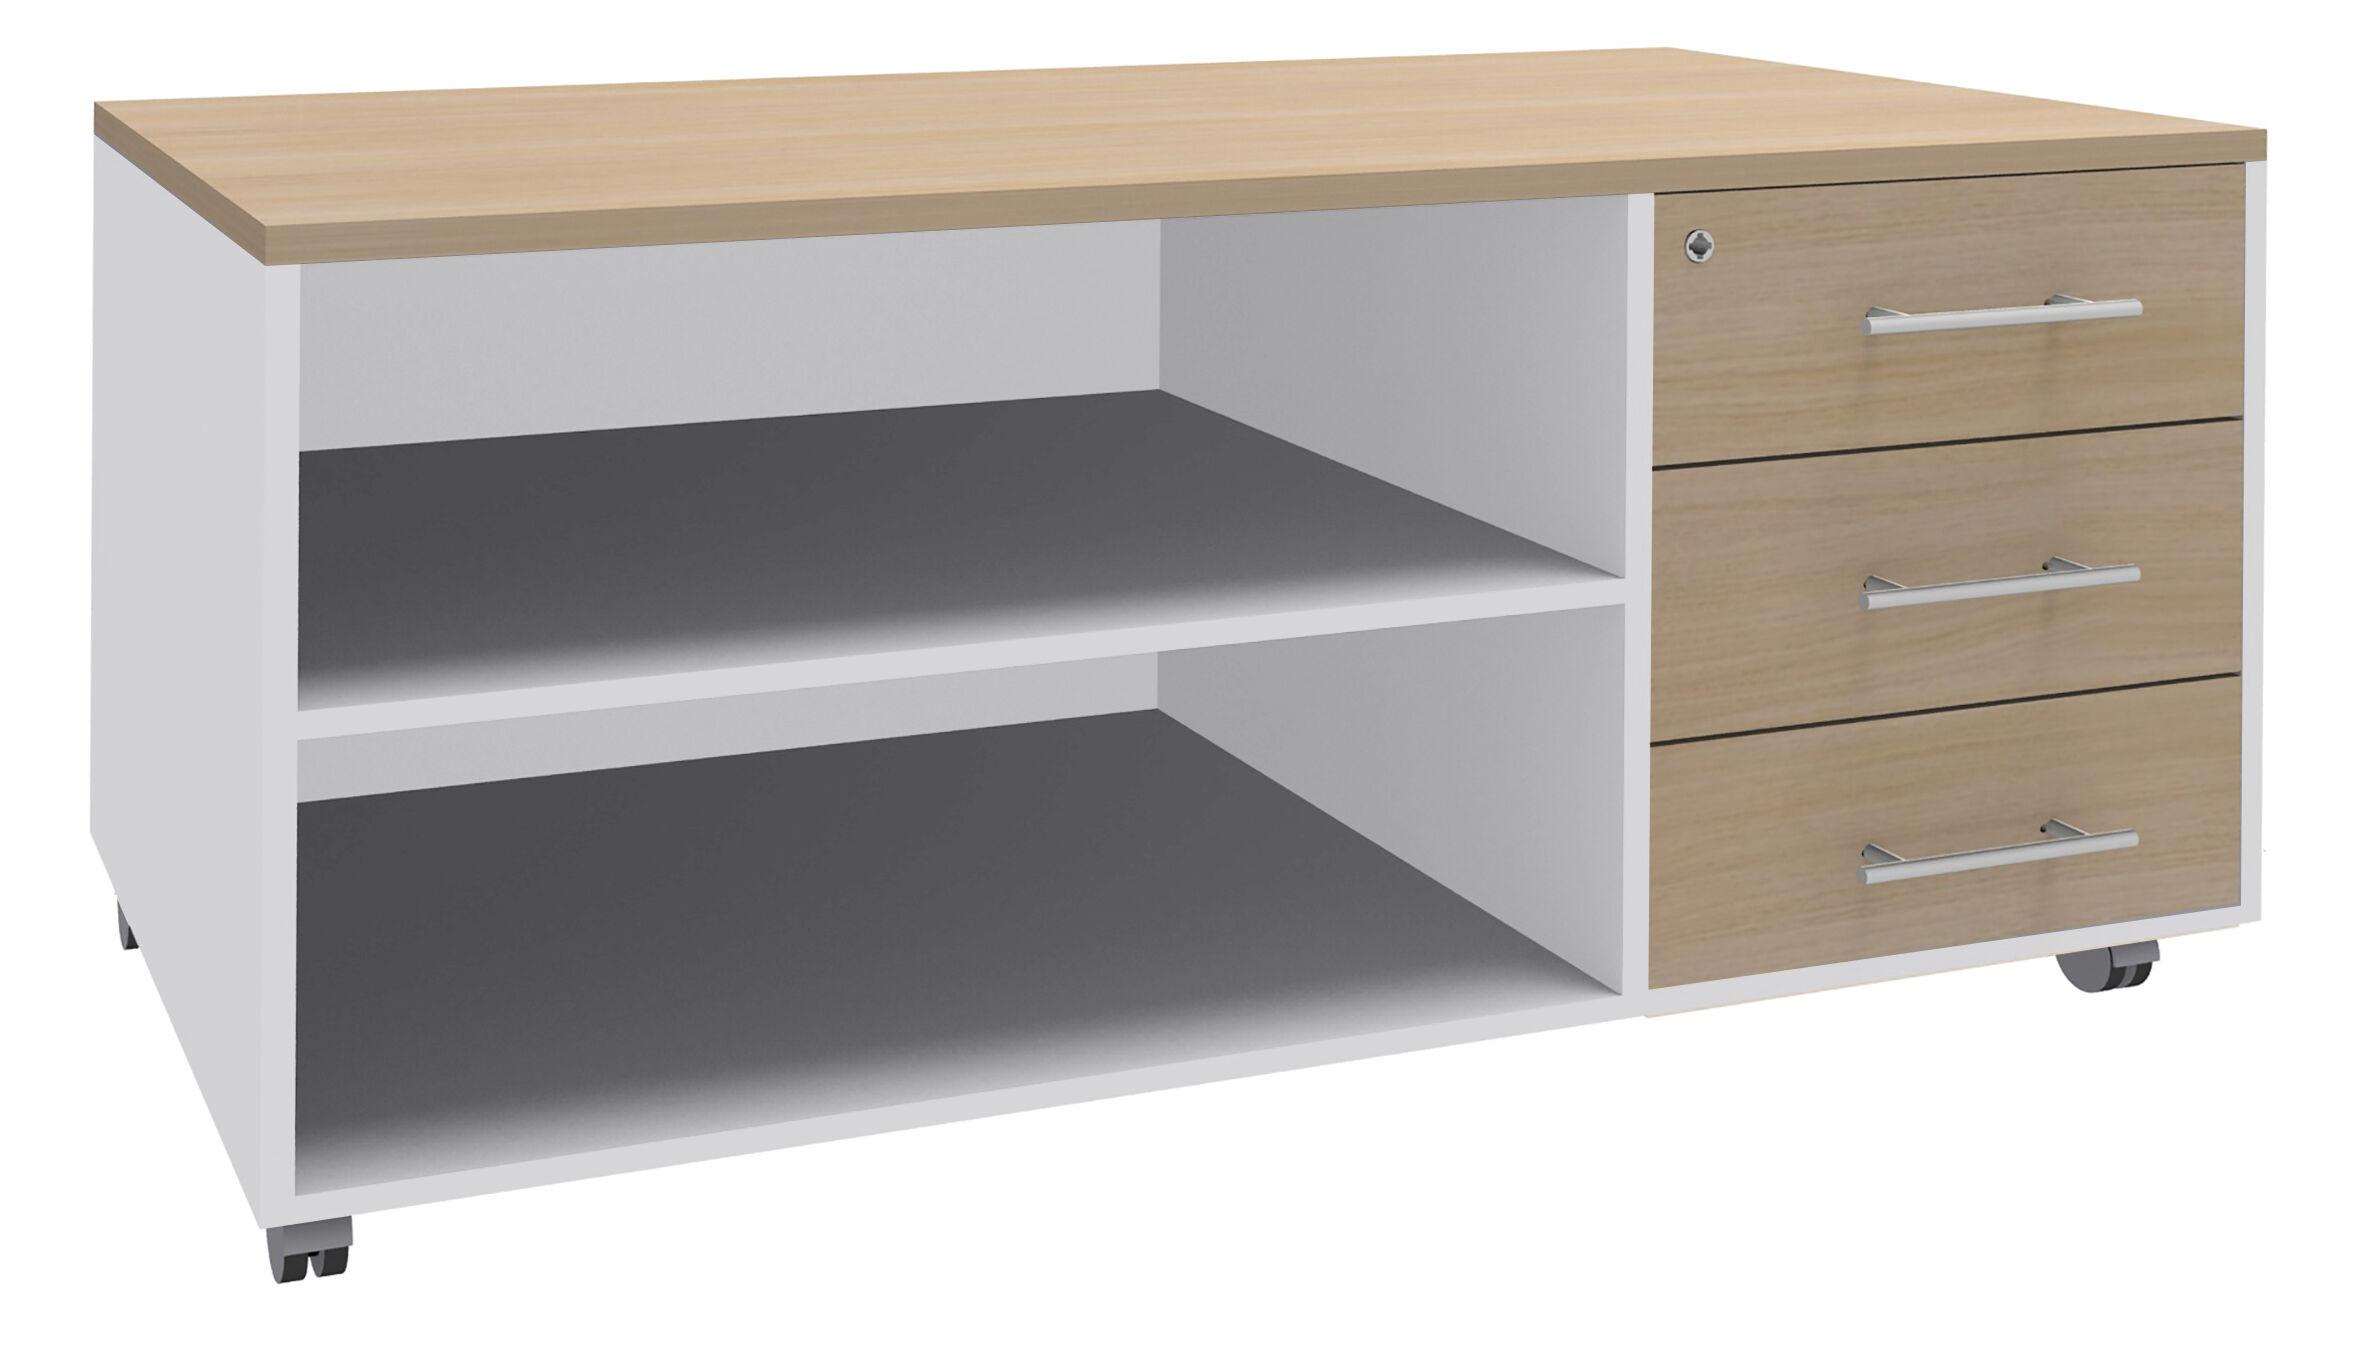 Console mobile WOODY - STEELY/STEELY Manager - L120 x H63 x P60 cm - 3 tiroirs - coté blanc - finition tiroirs et dessus imitation Chêne clair